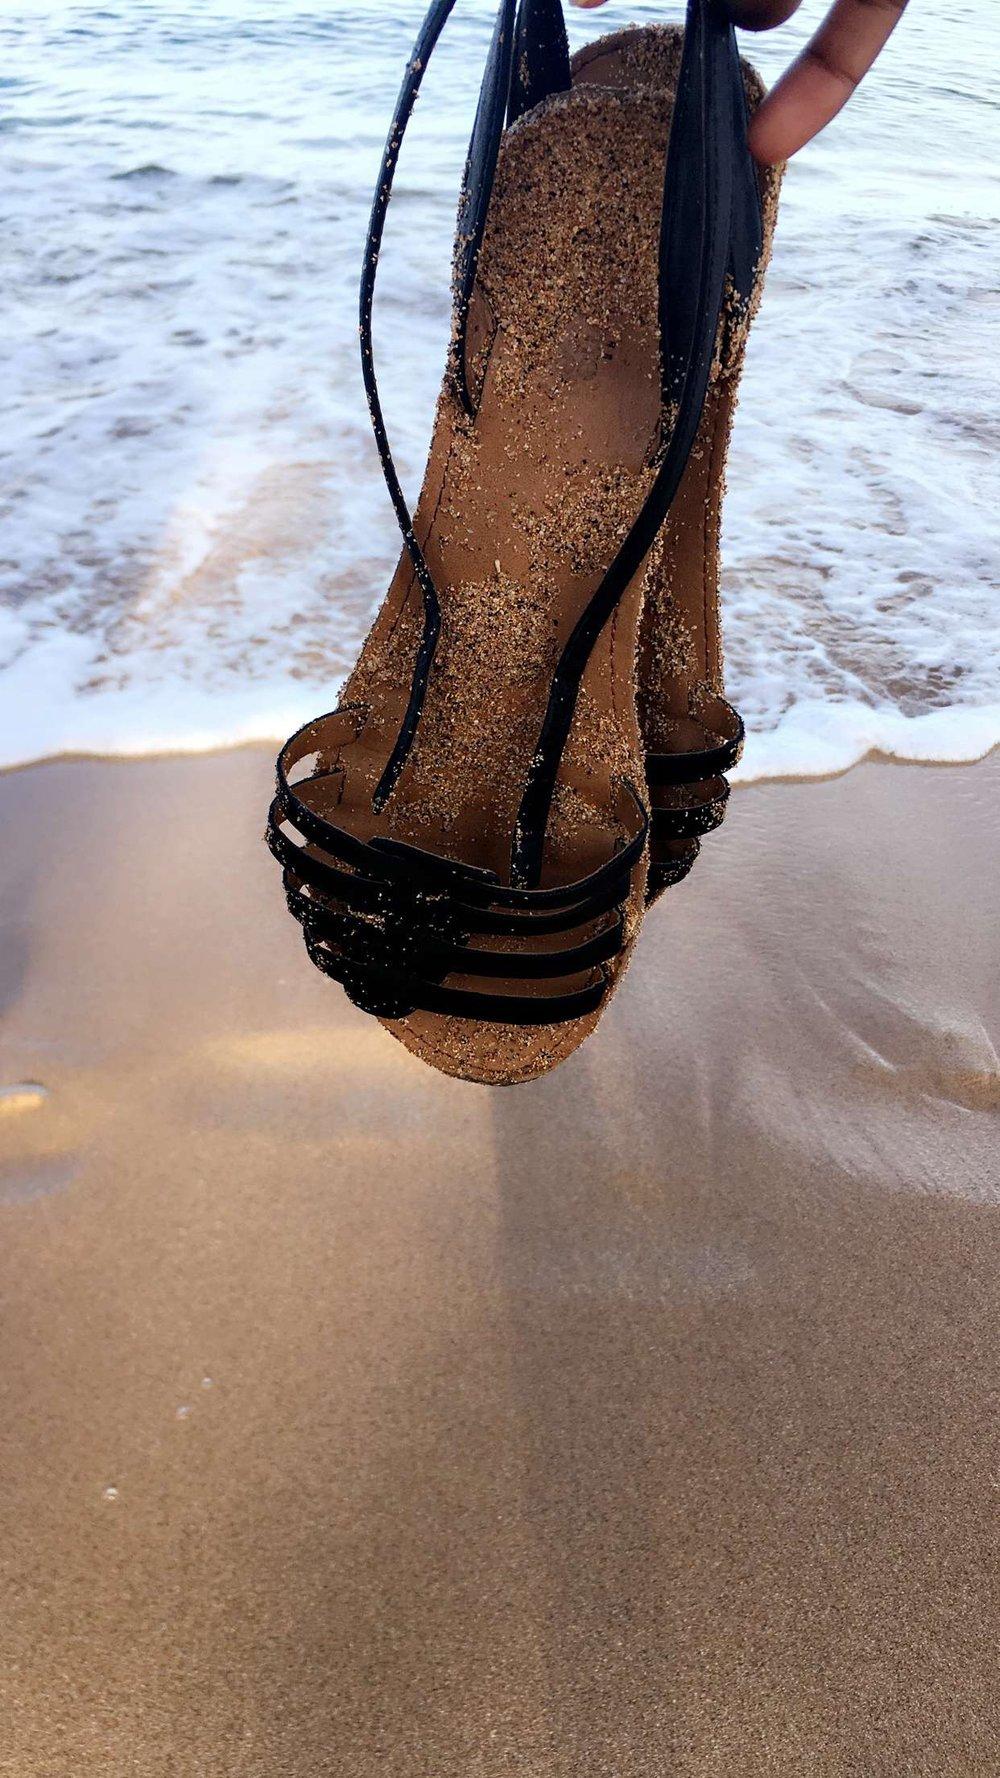 Sandy Sandals on Kā'anapali Beach Sandals